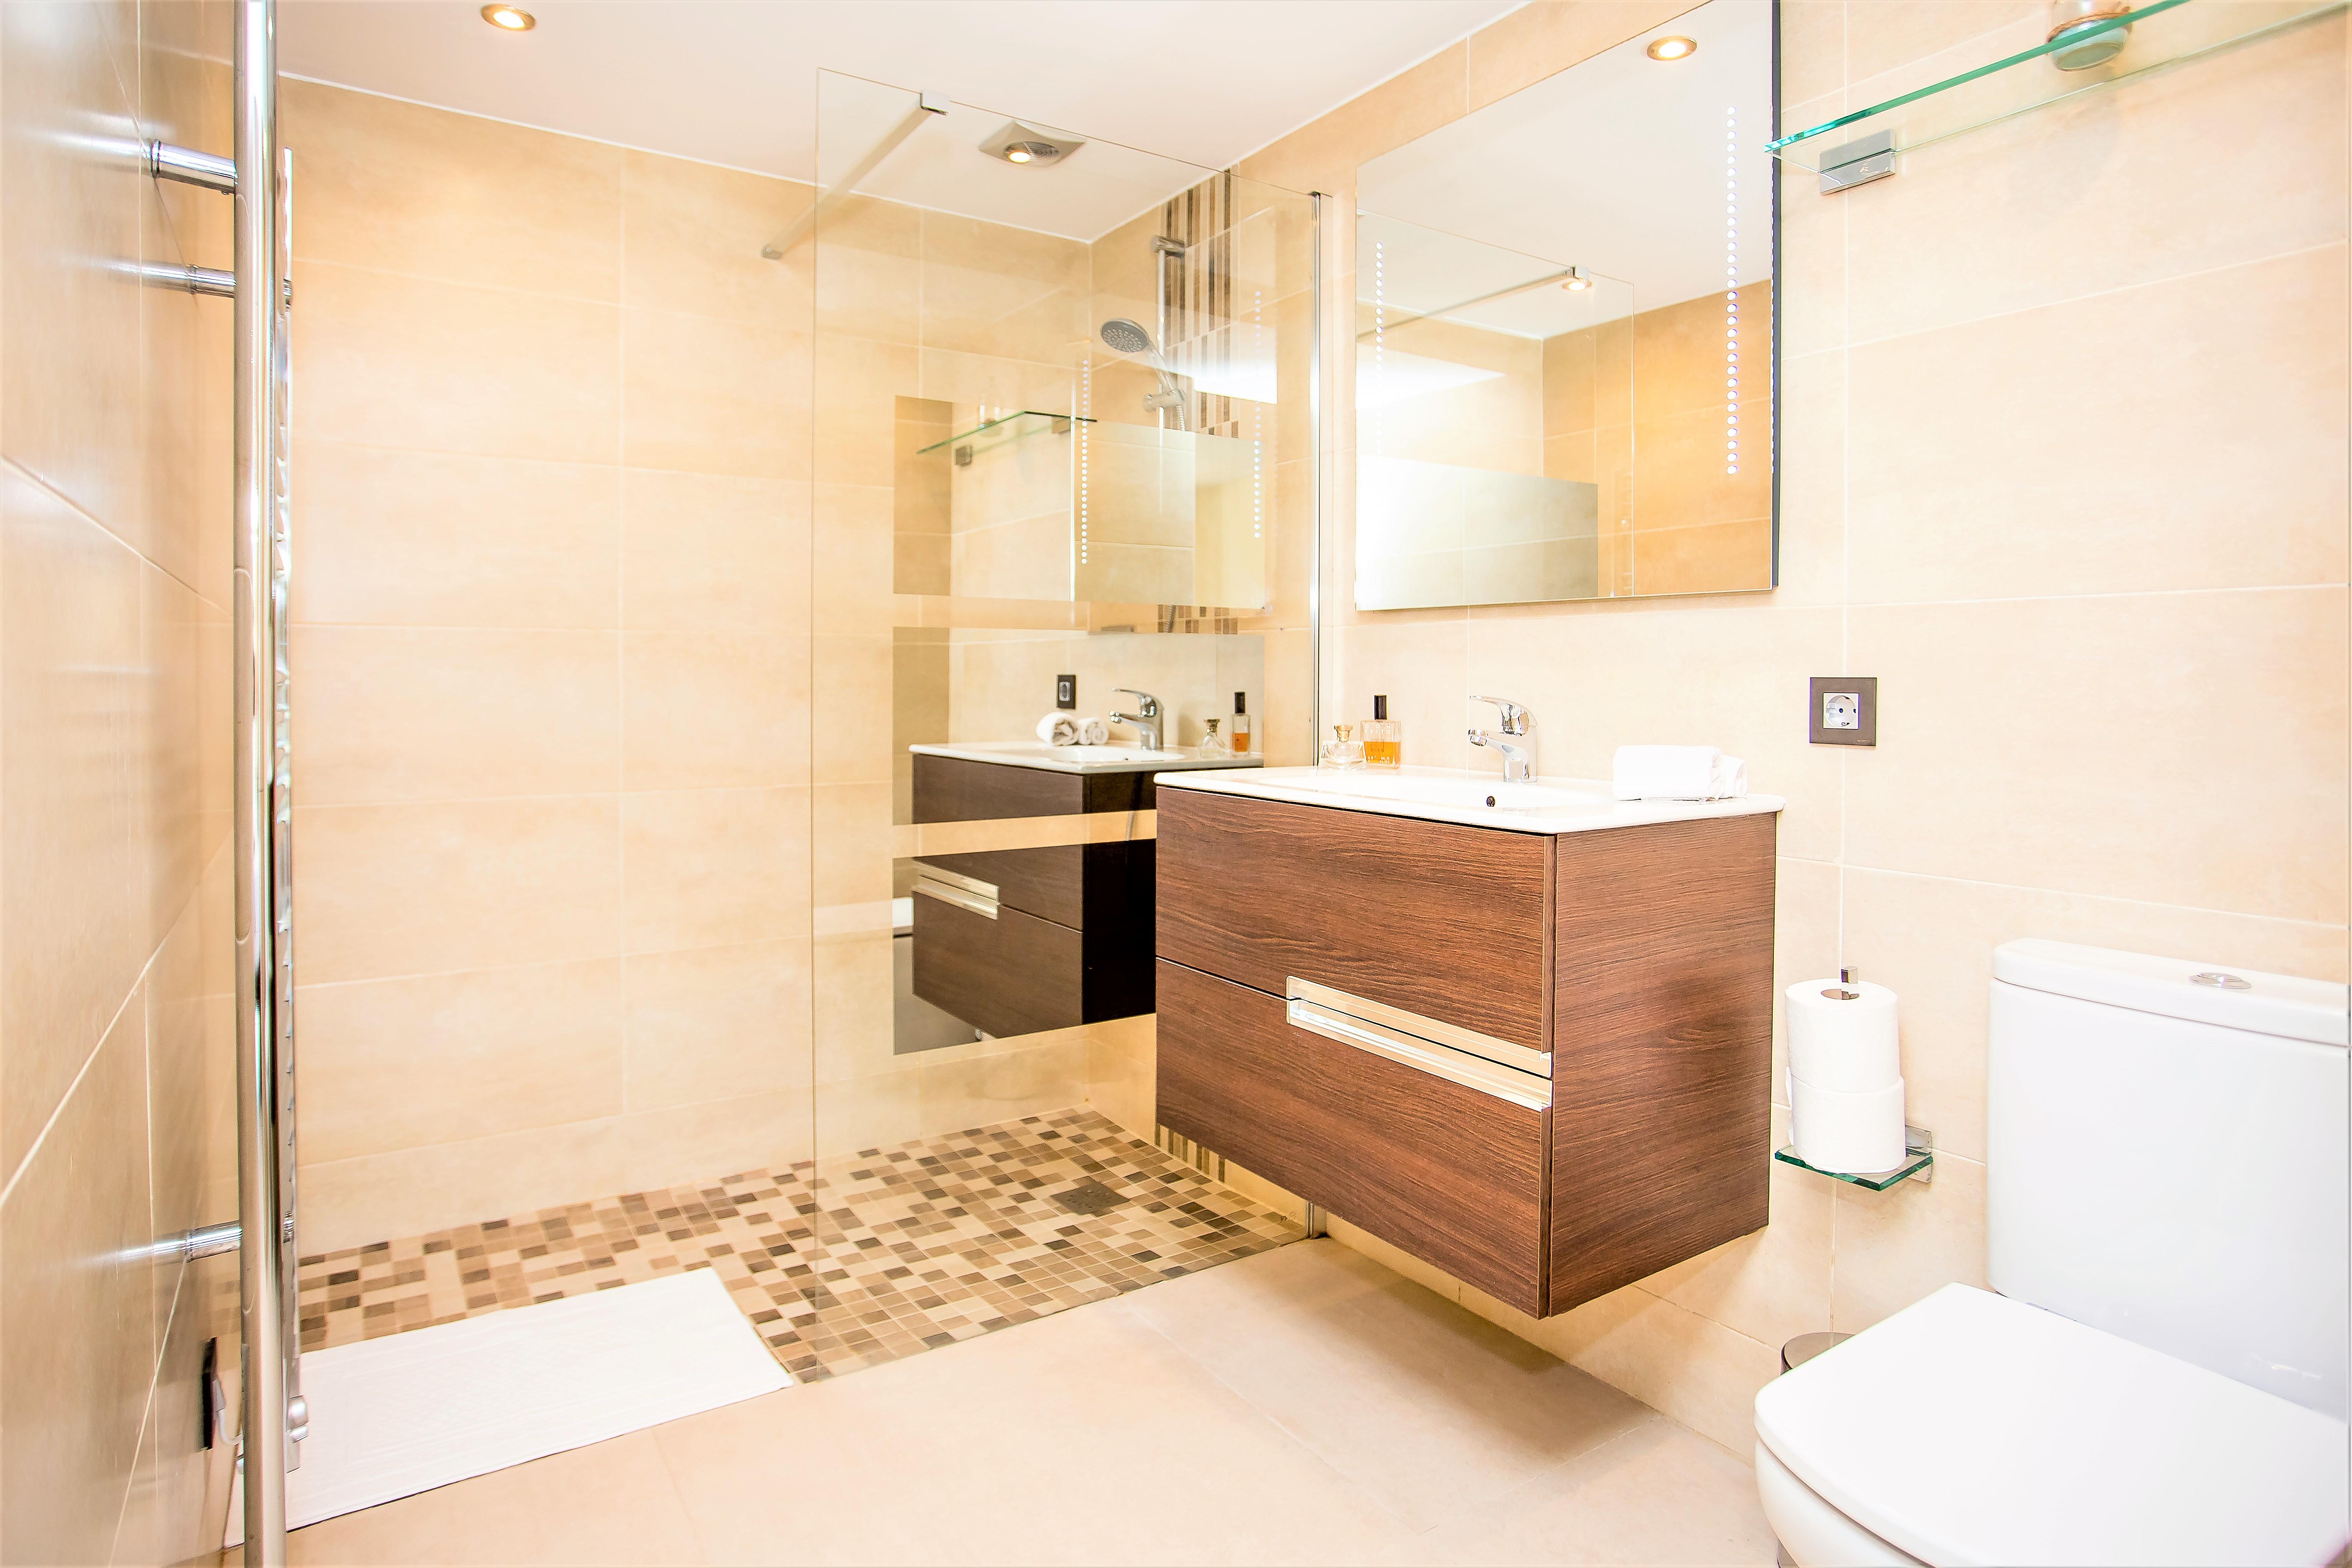 Apartment 5 B R VILLA BY PUERTO BANUS   SEA 5min                                photo 20147494